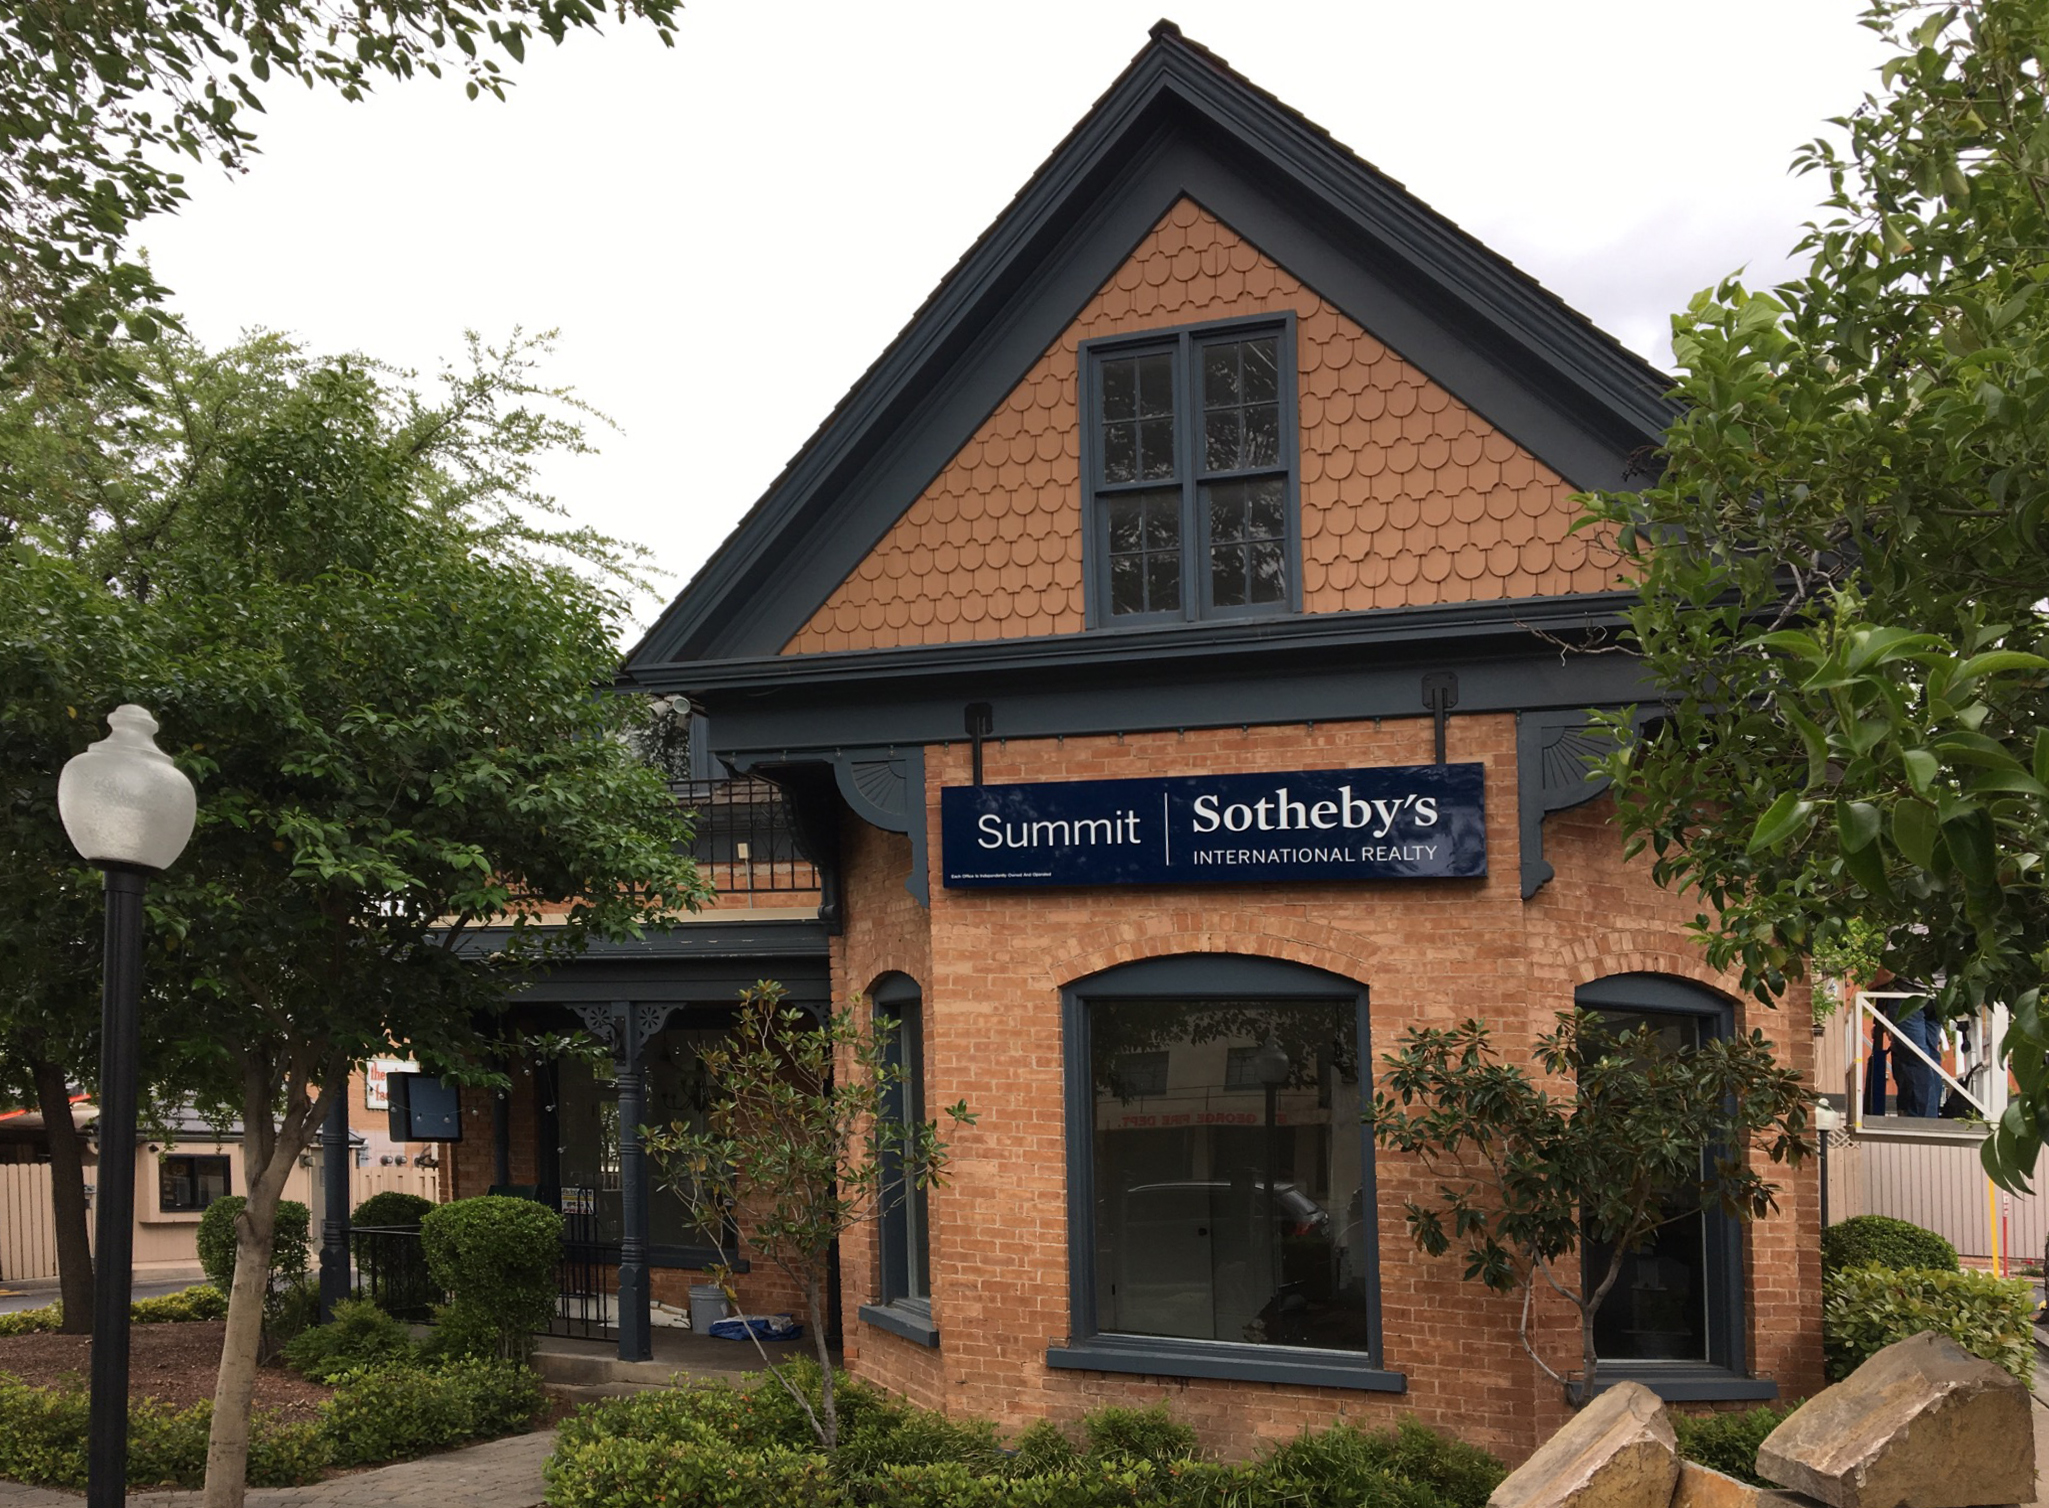 Summit Sotheby's International Realty